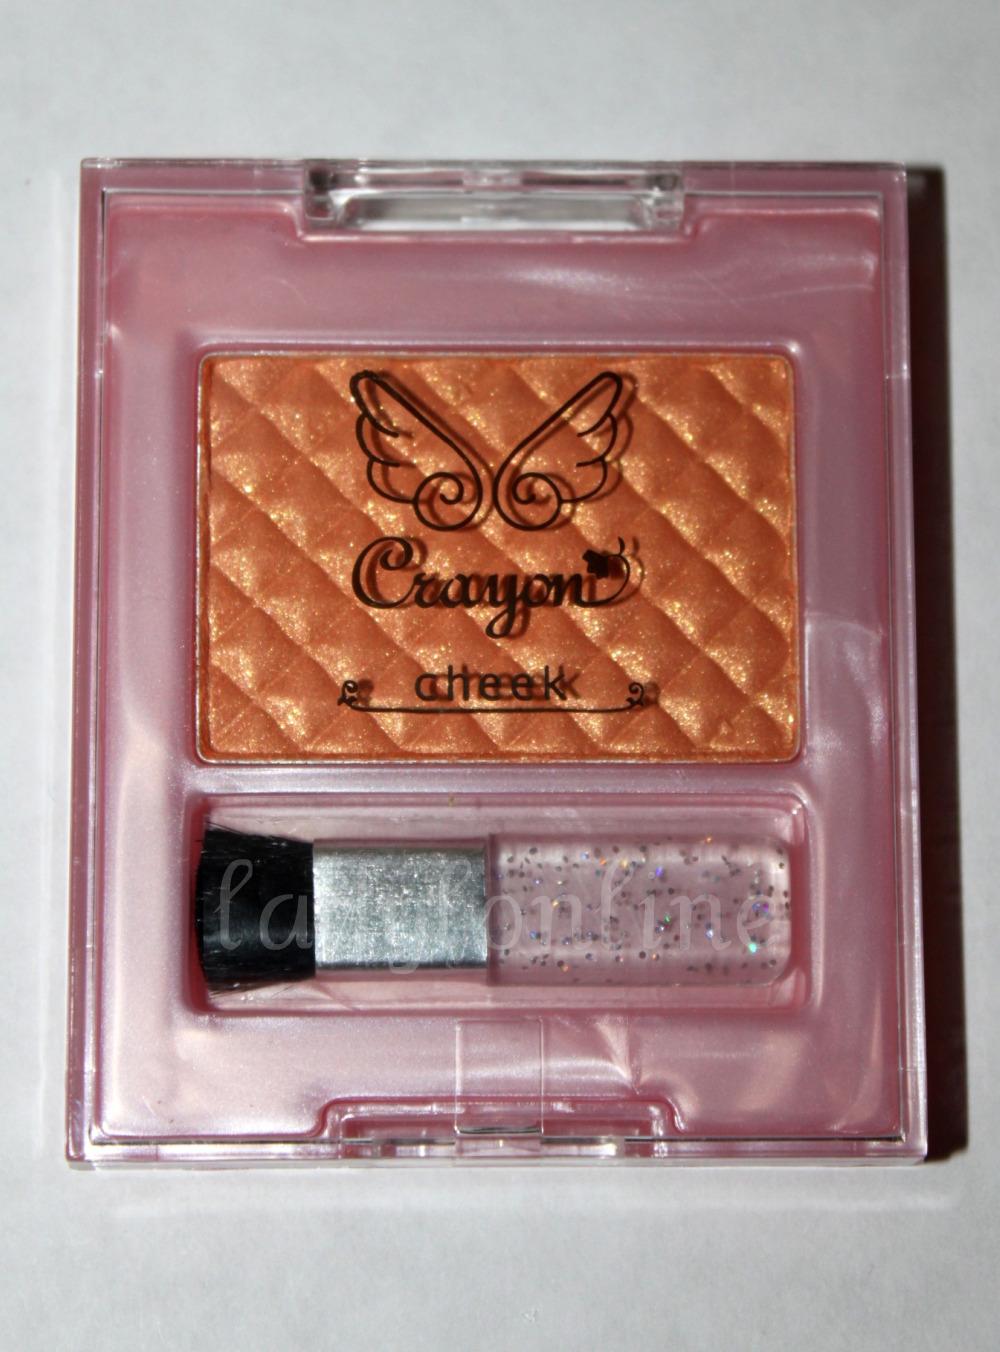 japanese cosmetics brands-49